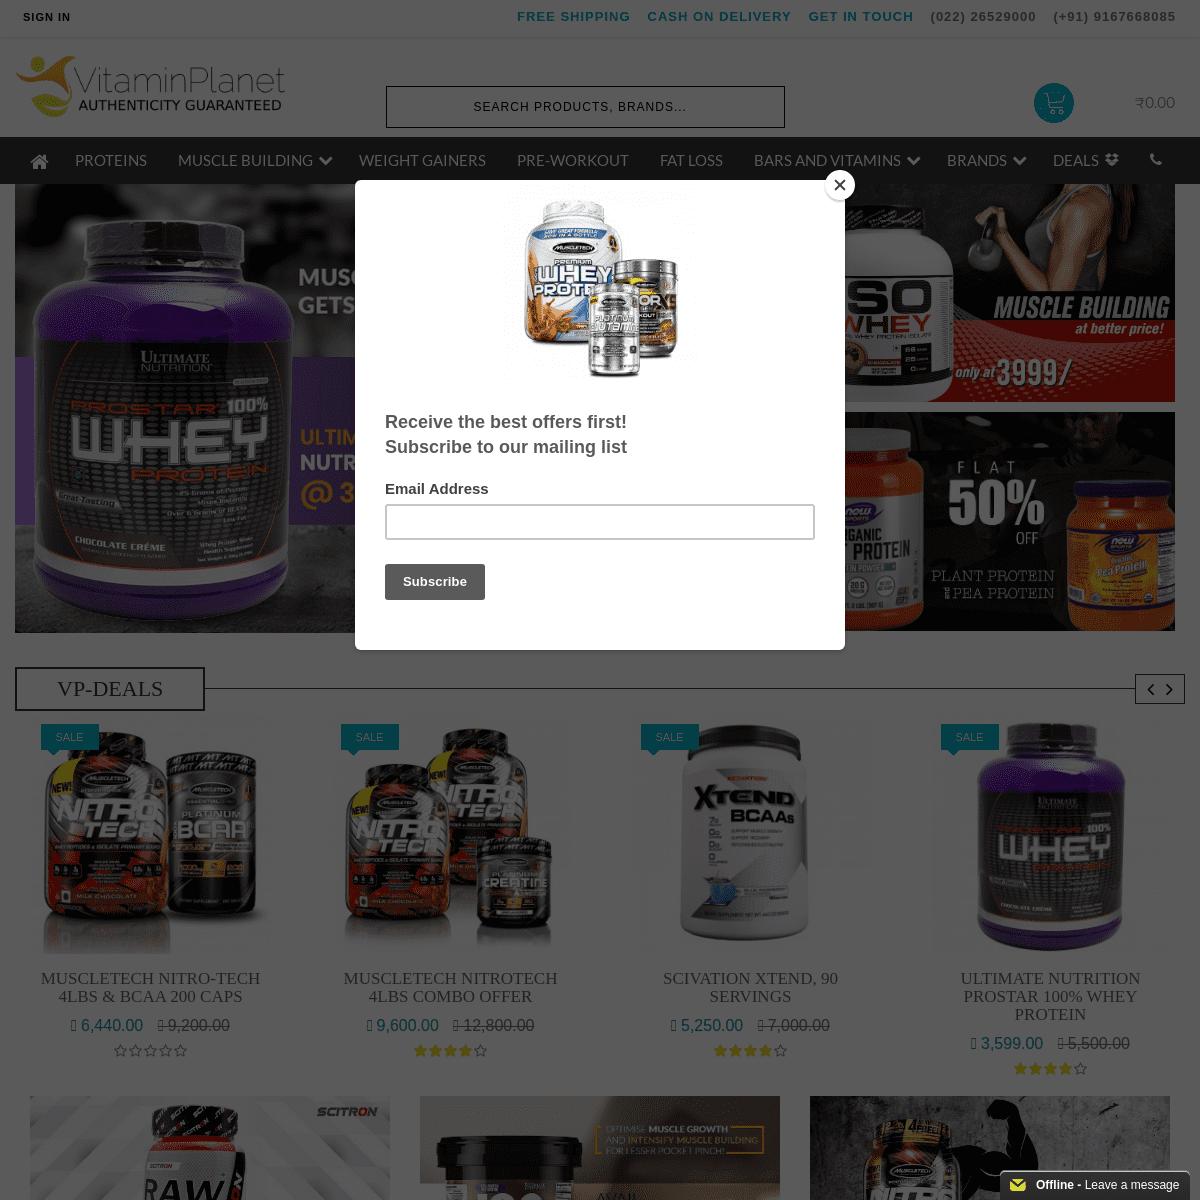 Online bodybuilding, sports nutrition supplements India - Vitamin Planet